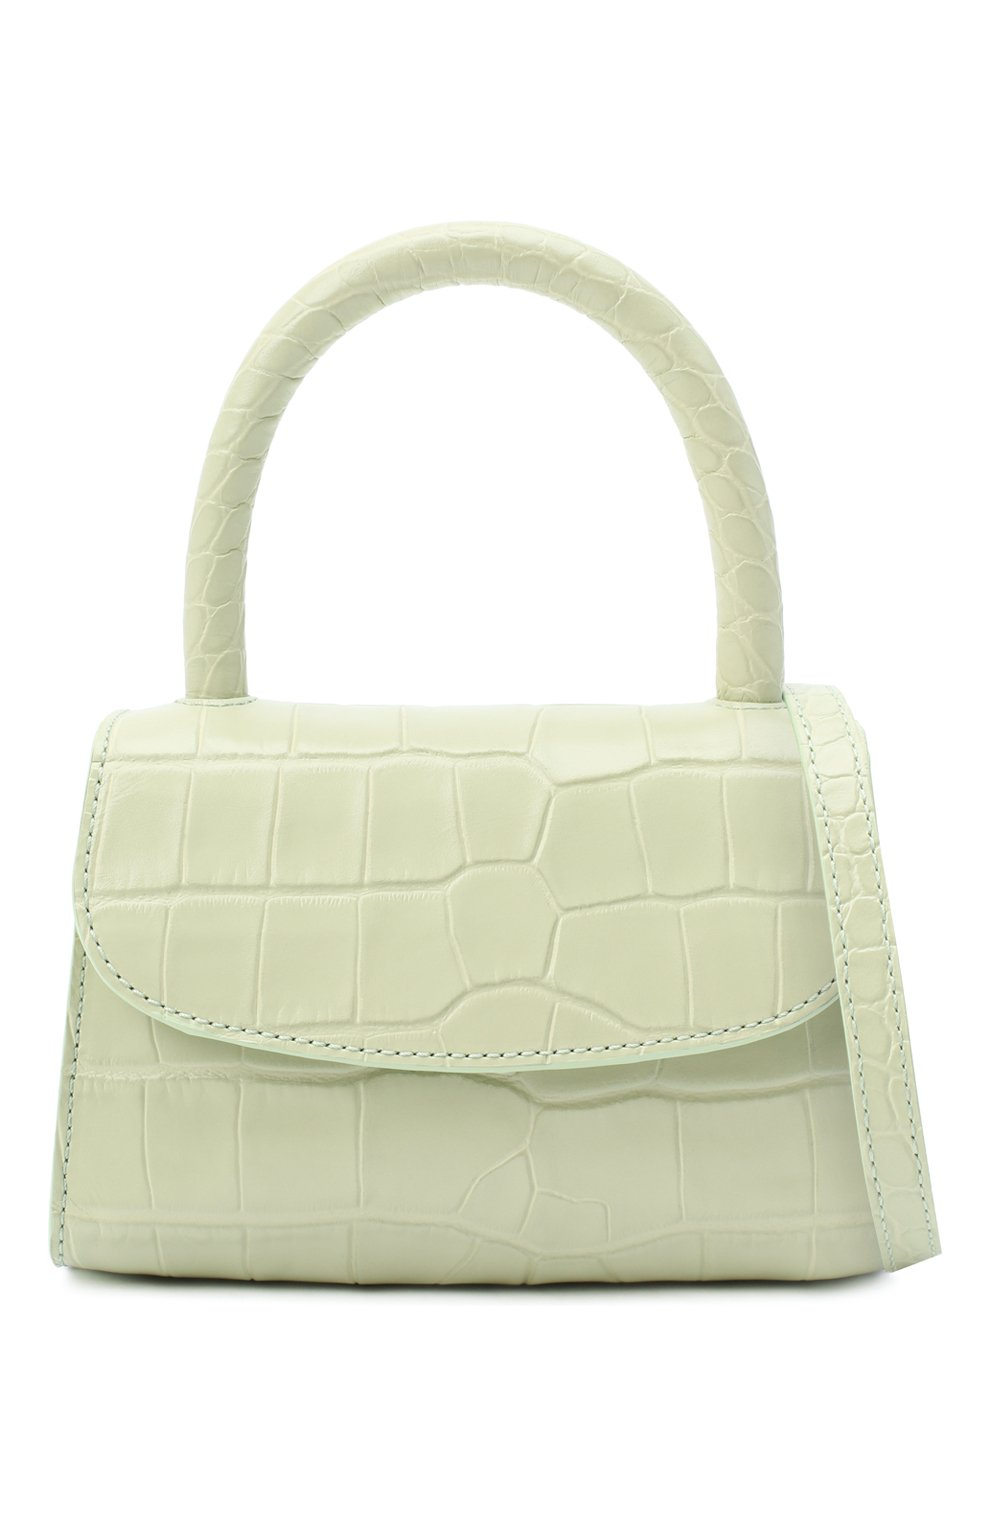 Женская сумка mini BY FAR светло-зеленого цвета, арт. 18FWMINASGDSMA | Фото 6 (Сумки-технические: Сумки через плечо, Сумки top-handle; Материал: Натуральная кожа; Размер: mini; Ремень/цепочка: На ремешке)